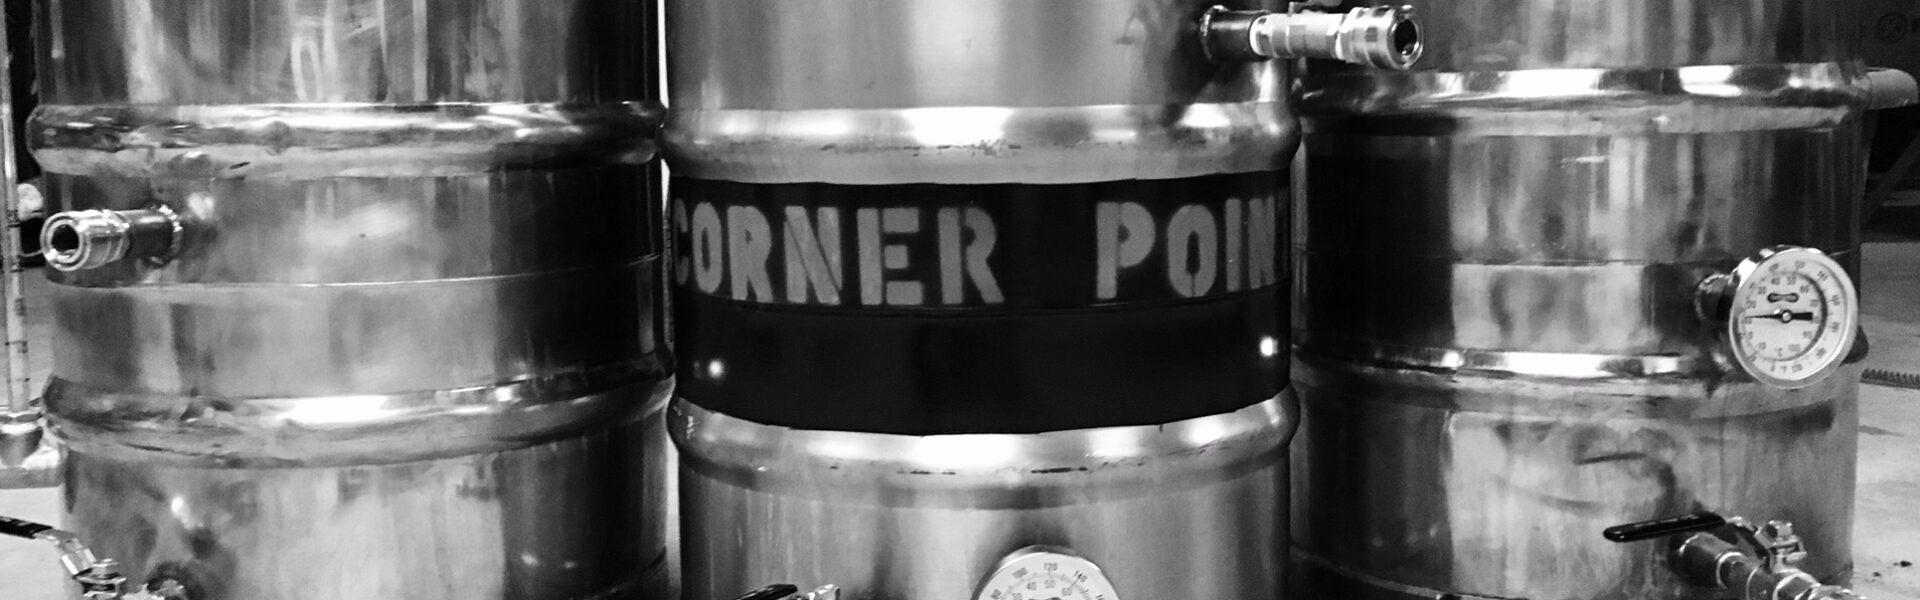 Corner Point Brewing Company